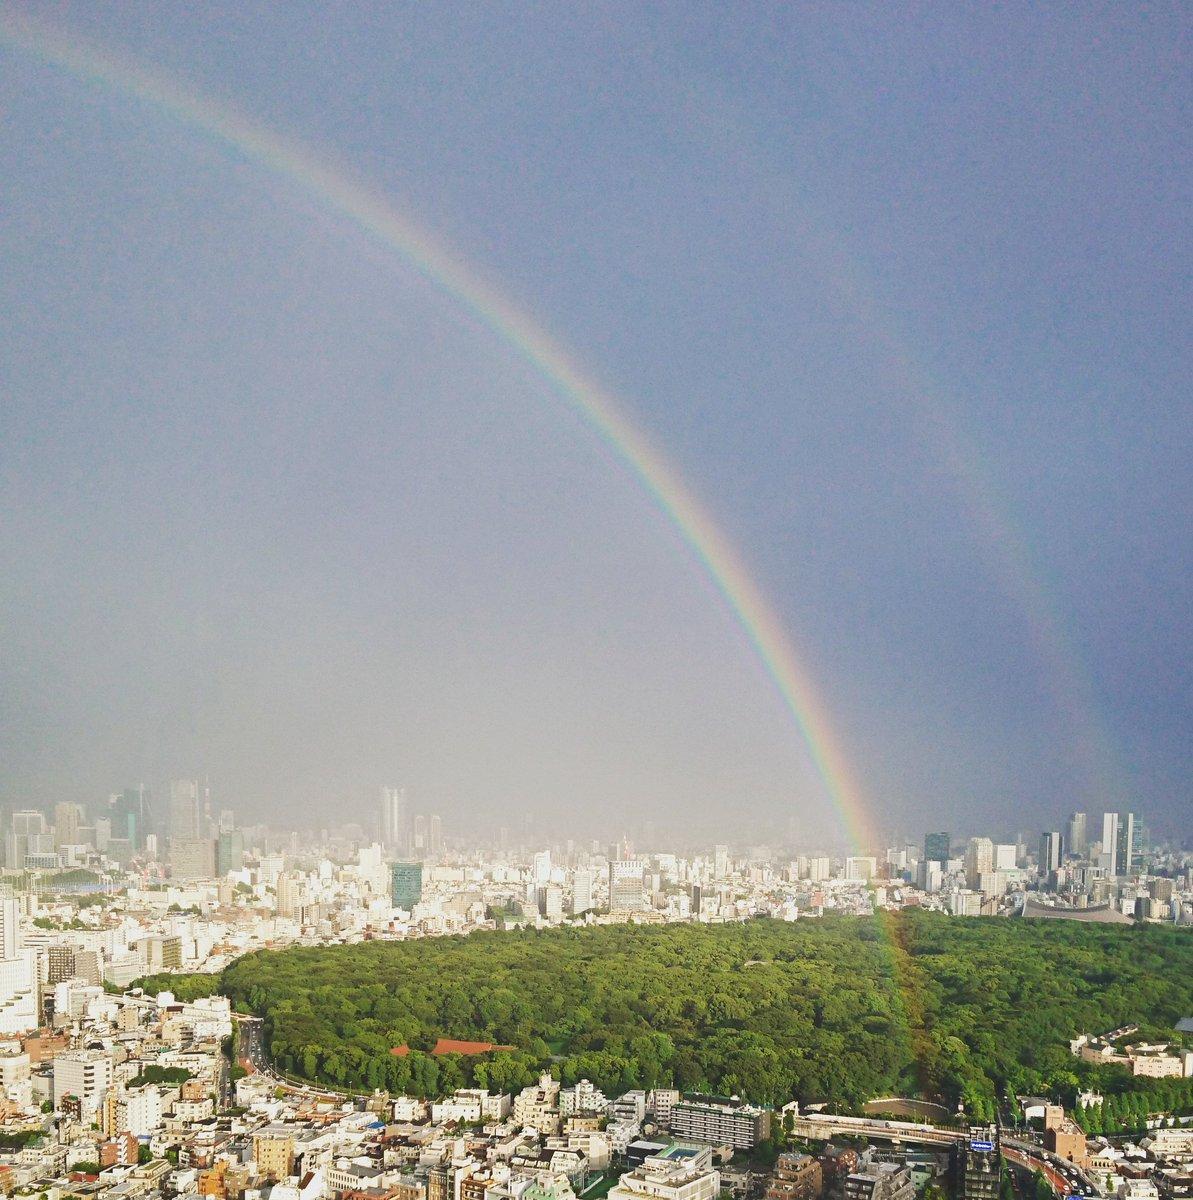 Beautiful double-rainbow colored belt across the city. 雨上がりの夕空に美しい二重の虹がかかりました。素敵な1週間の幕開けとなりそうですね!#rainbow #MyLuxList https://t.co/XJCRiRdPqI